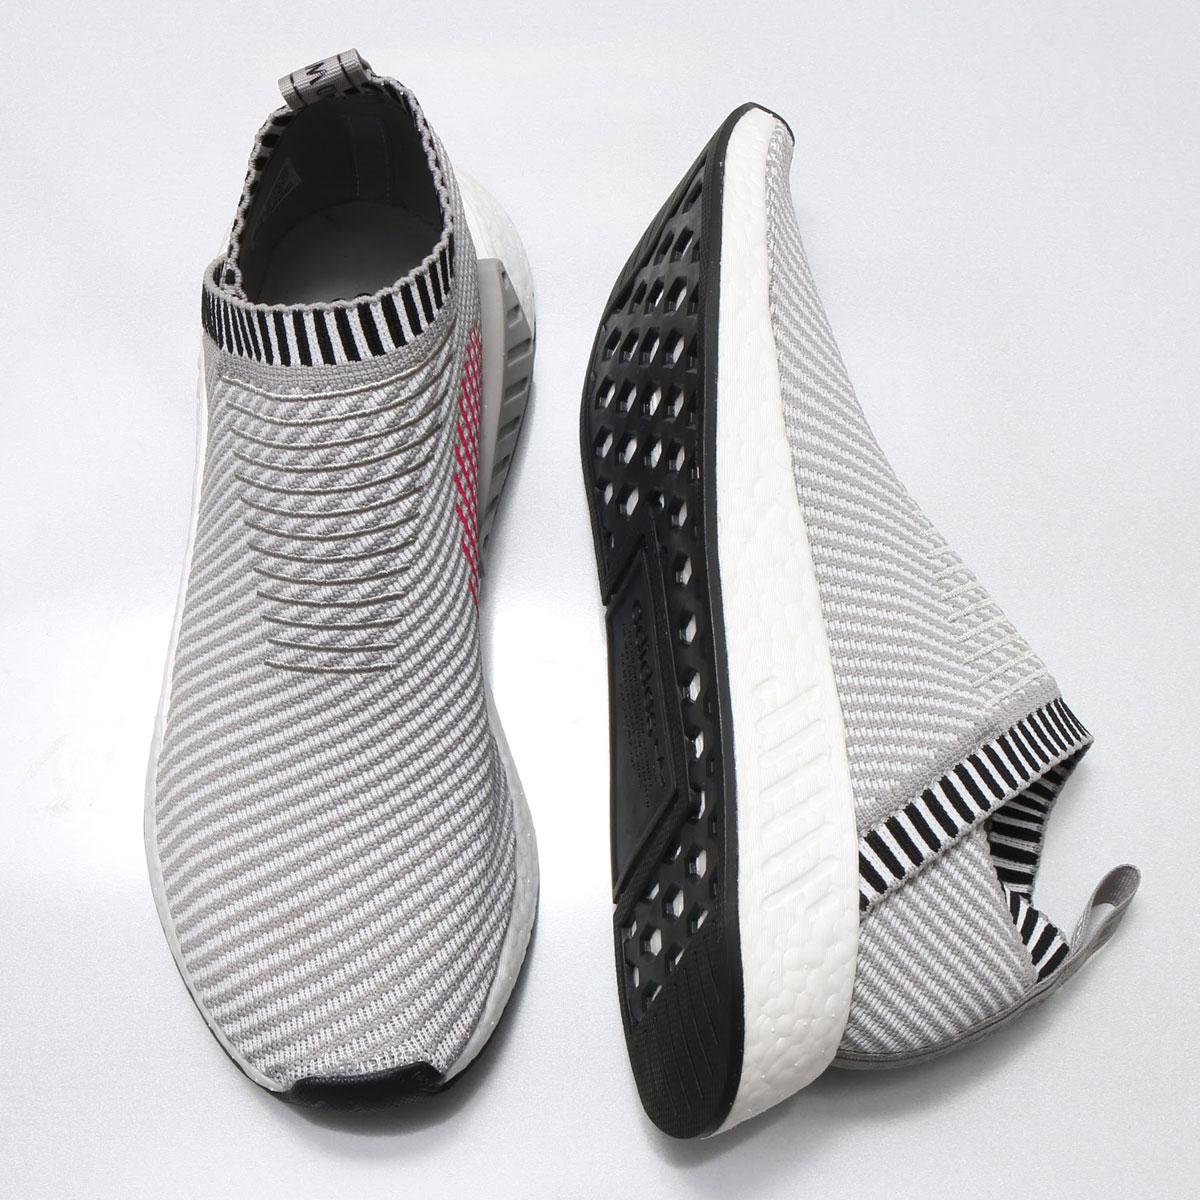 adidas Originals NMD CS2 PK (アディダス オリジナルス NMD CS2 PK) DGH SOLID GREY【メンズ スニーカー】17SS-S